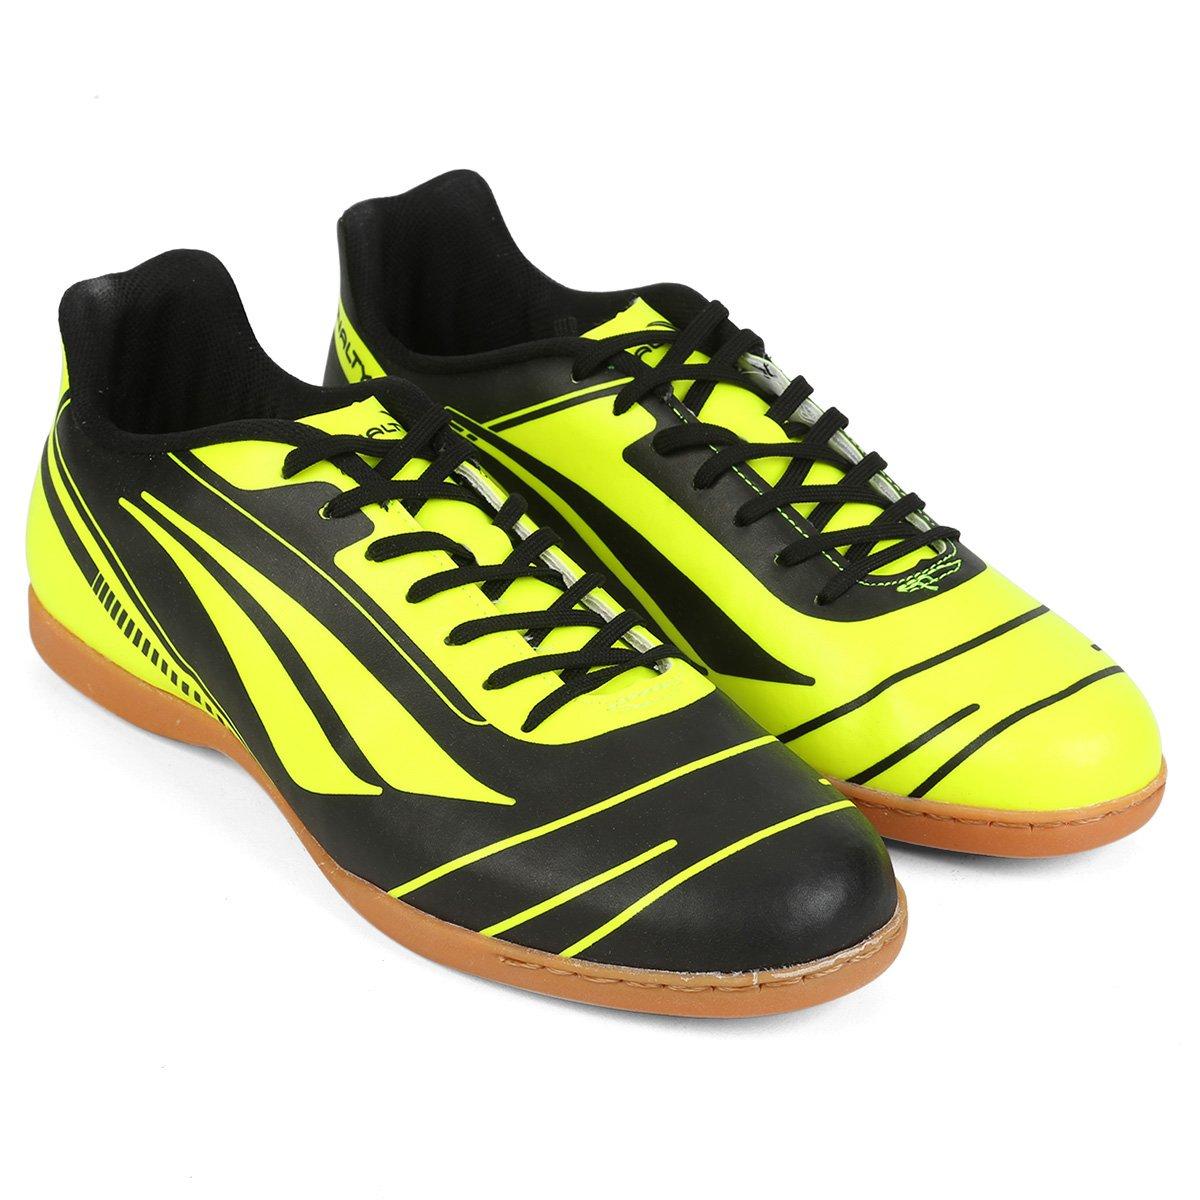 f2f99da3fa07e Chuteira Futsal Penalty Era 6 - Edição Limitada Masculina - Compre Agora